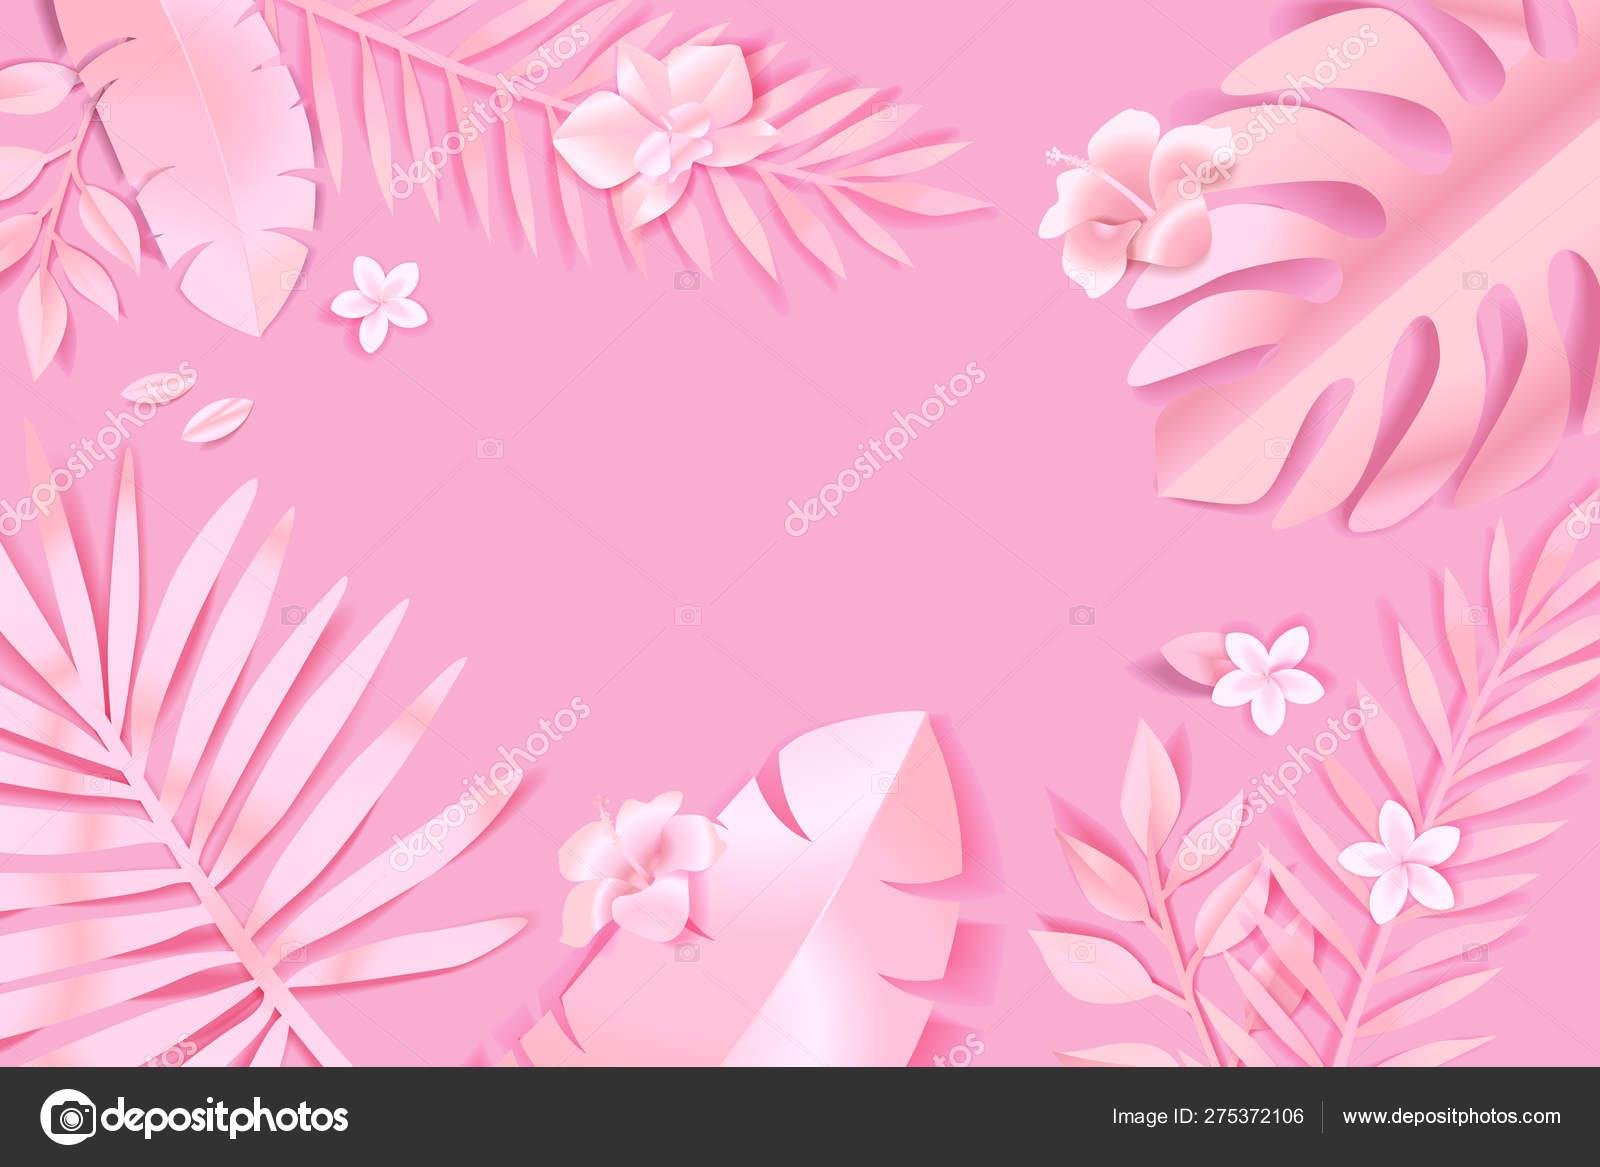 Beauty Nature Background Concept Website Design Advertising Social Media Banner Stock Vector C Variant 275372106